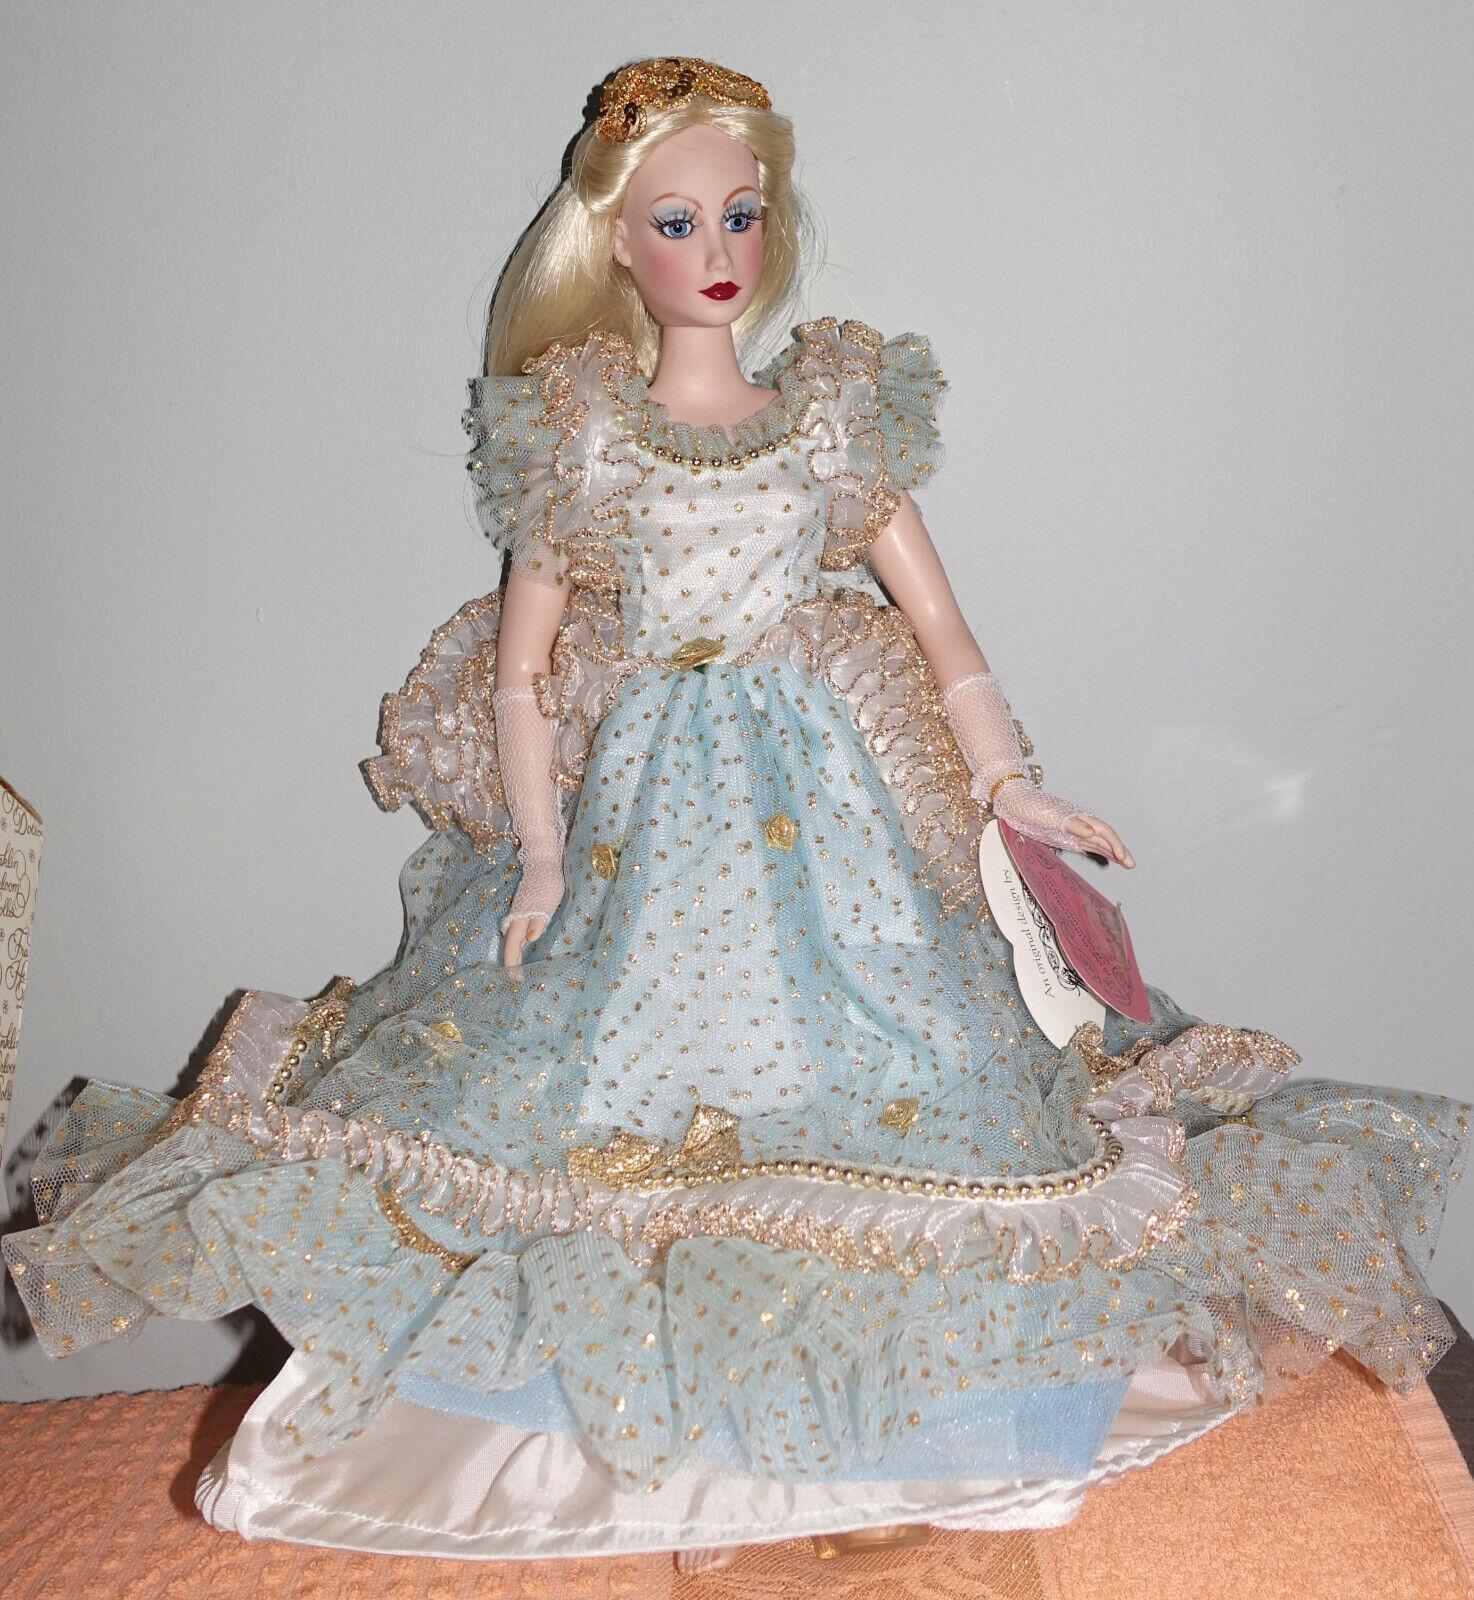 Franklin Mint Heirloom by Marice Nicole Cinderella Vinyl Doll